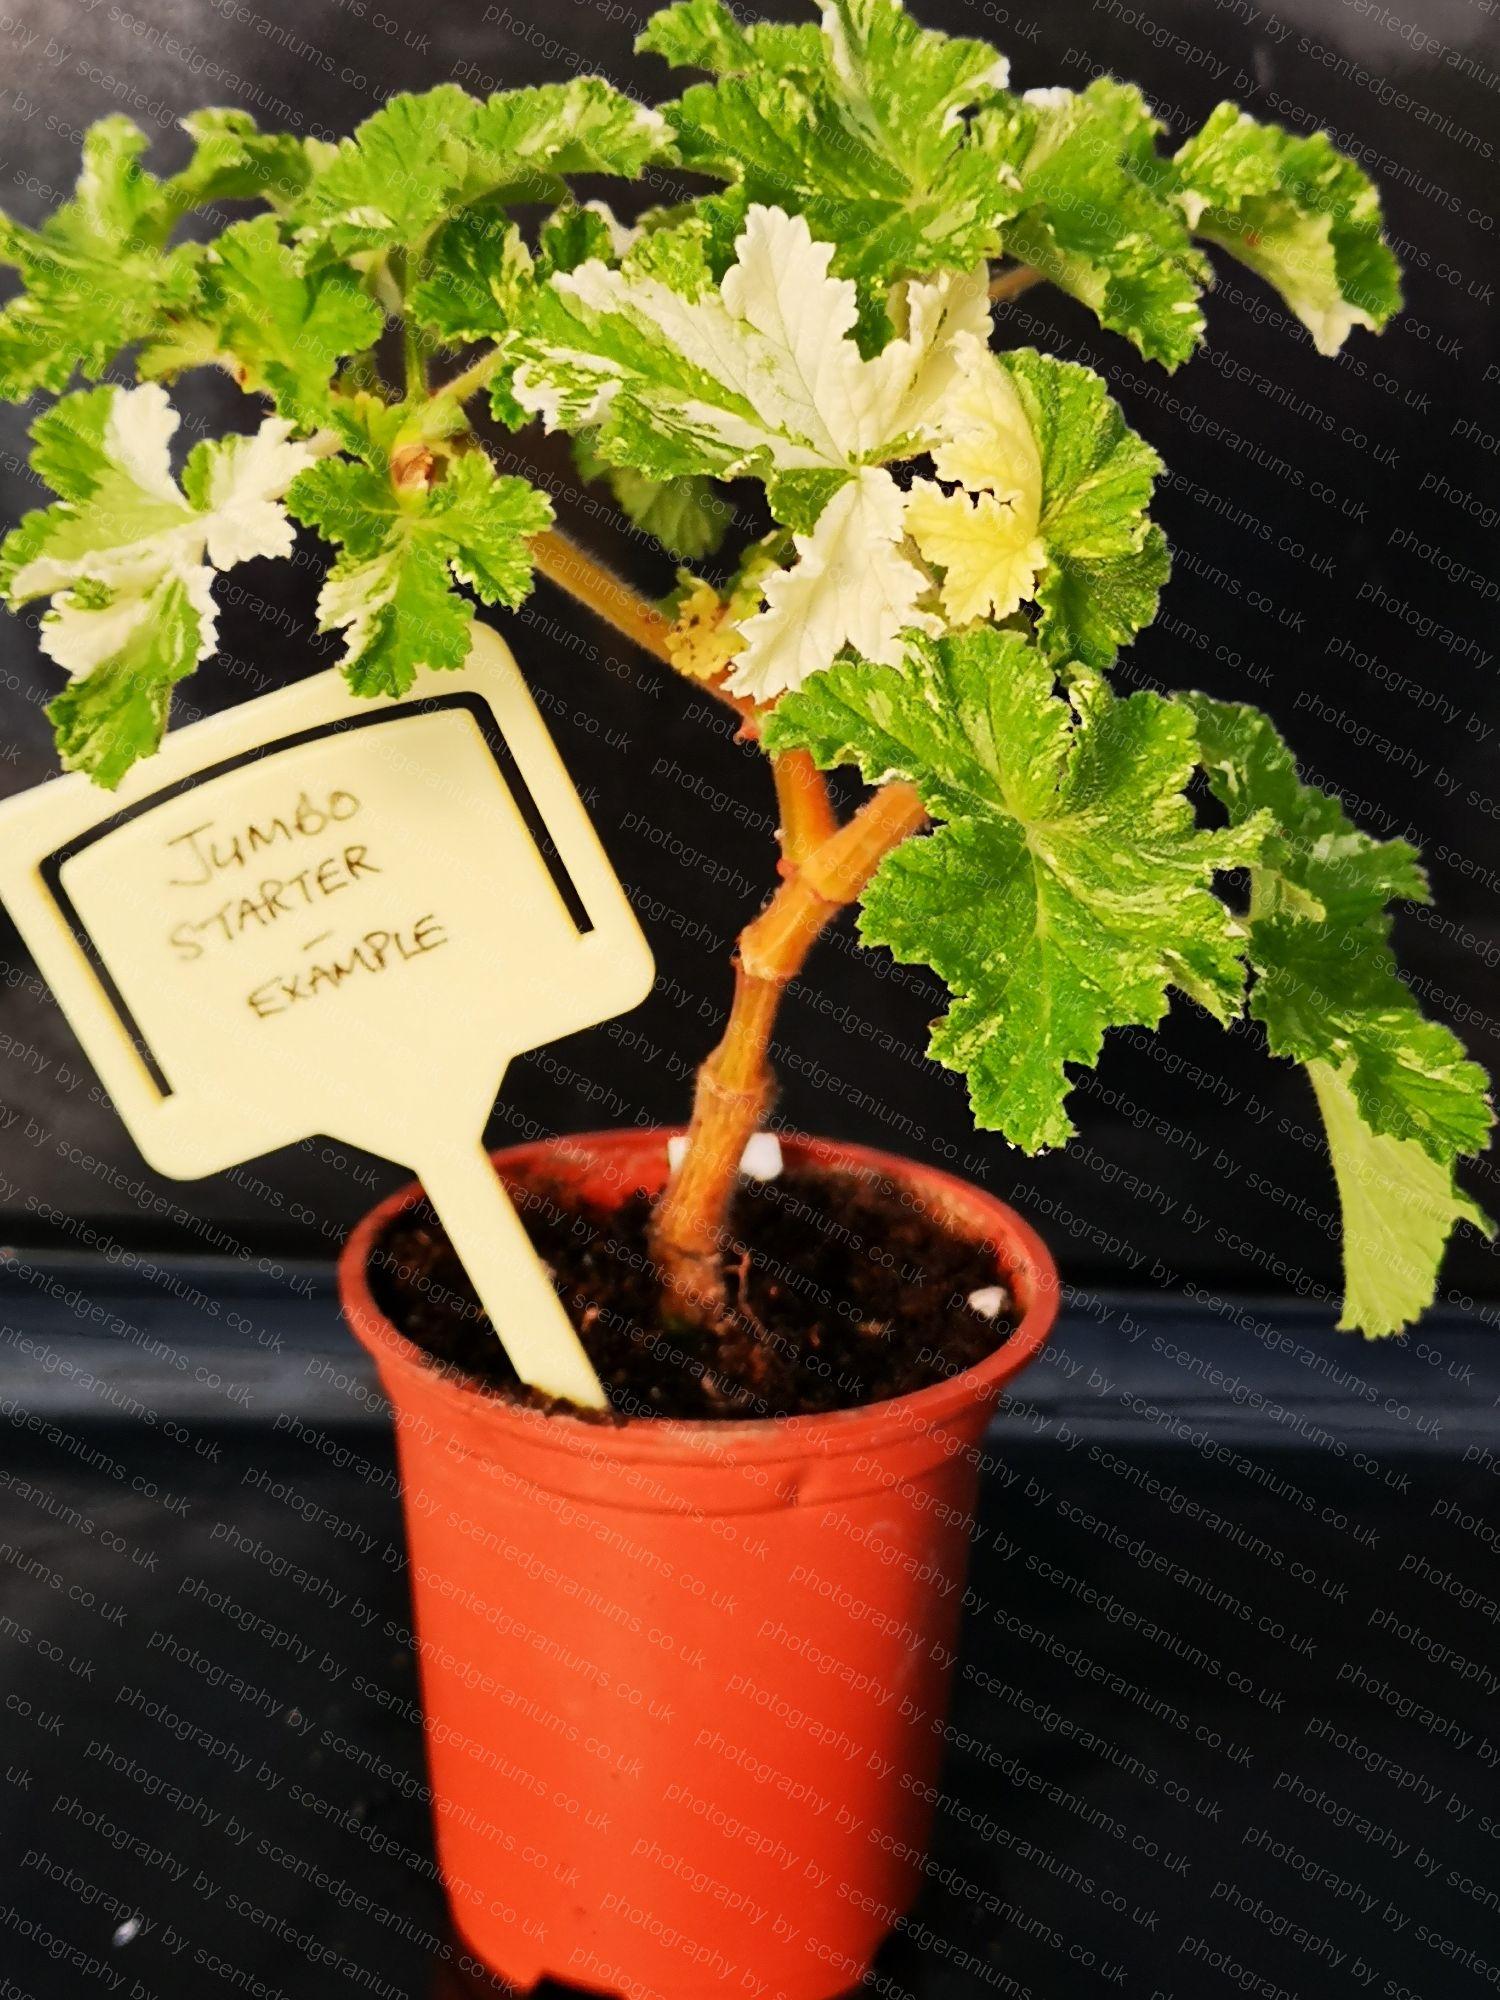 P. charmay snowflurry scentedgeraniums.co.uk